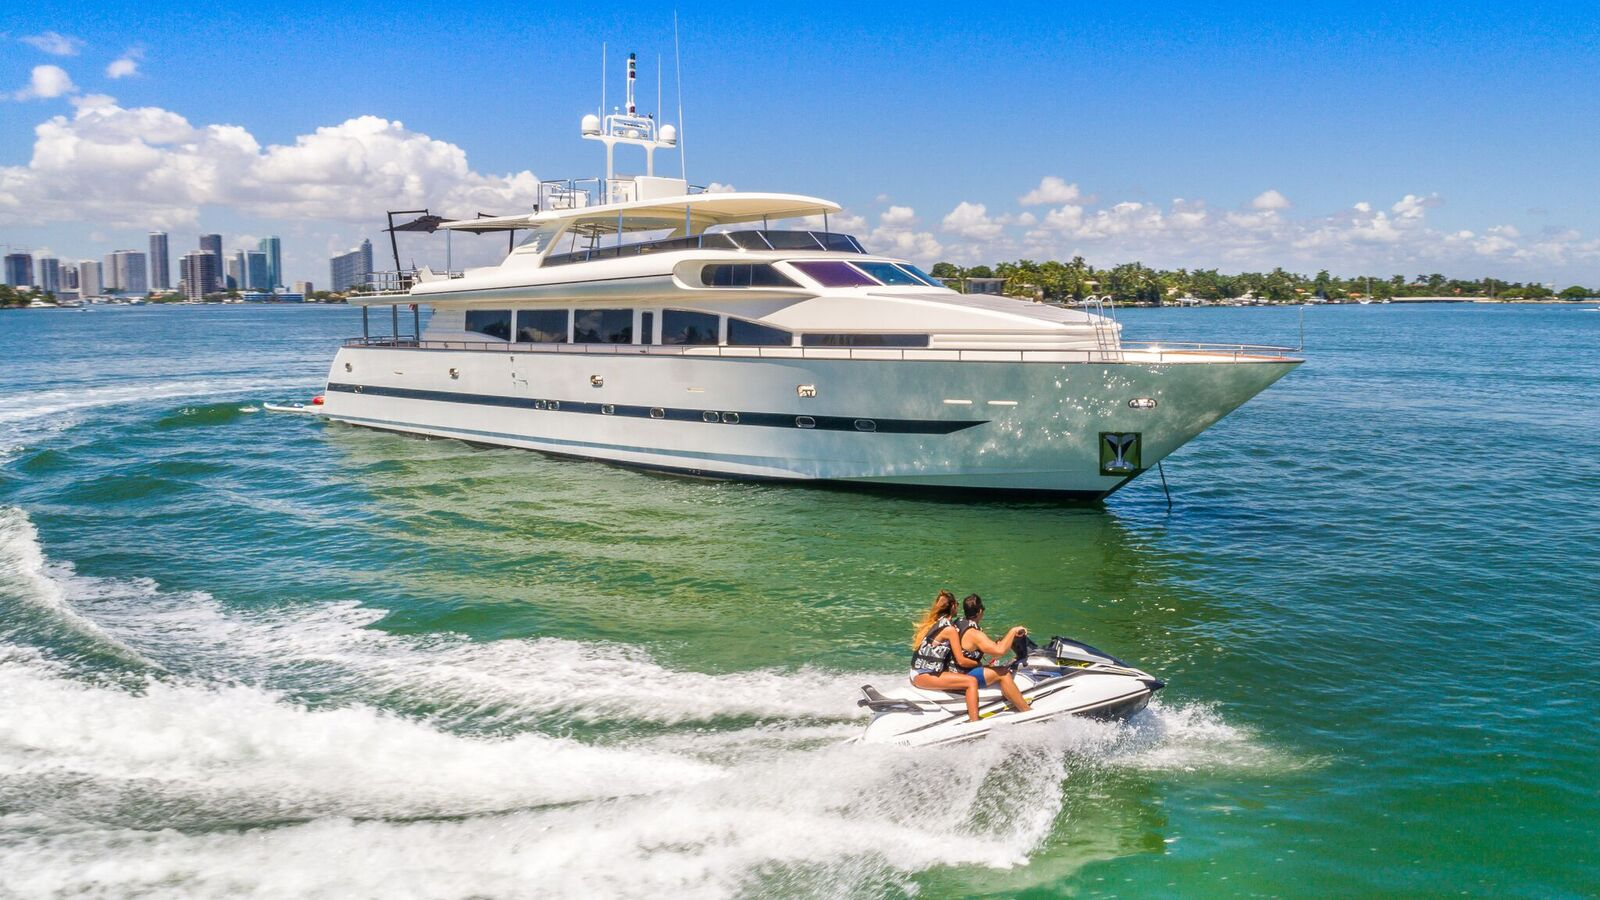 super yacht rental miami beach and jet ski